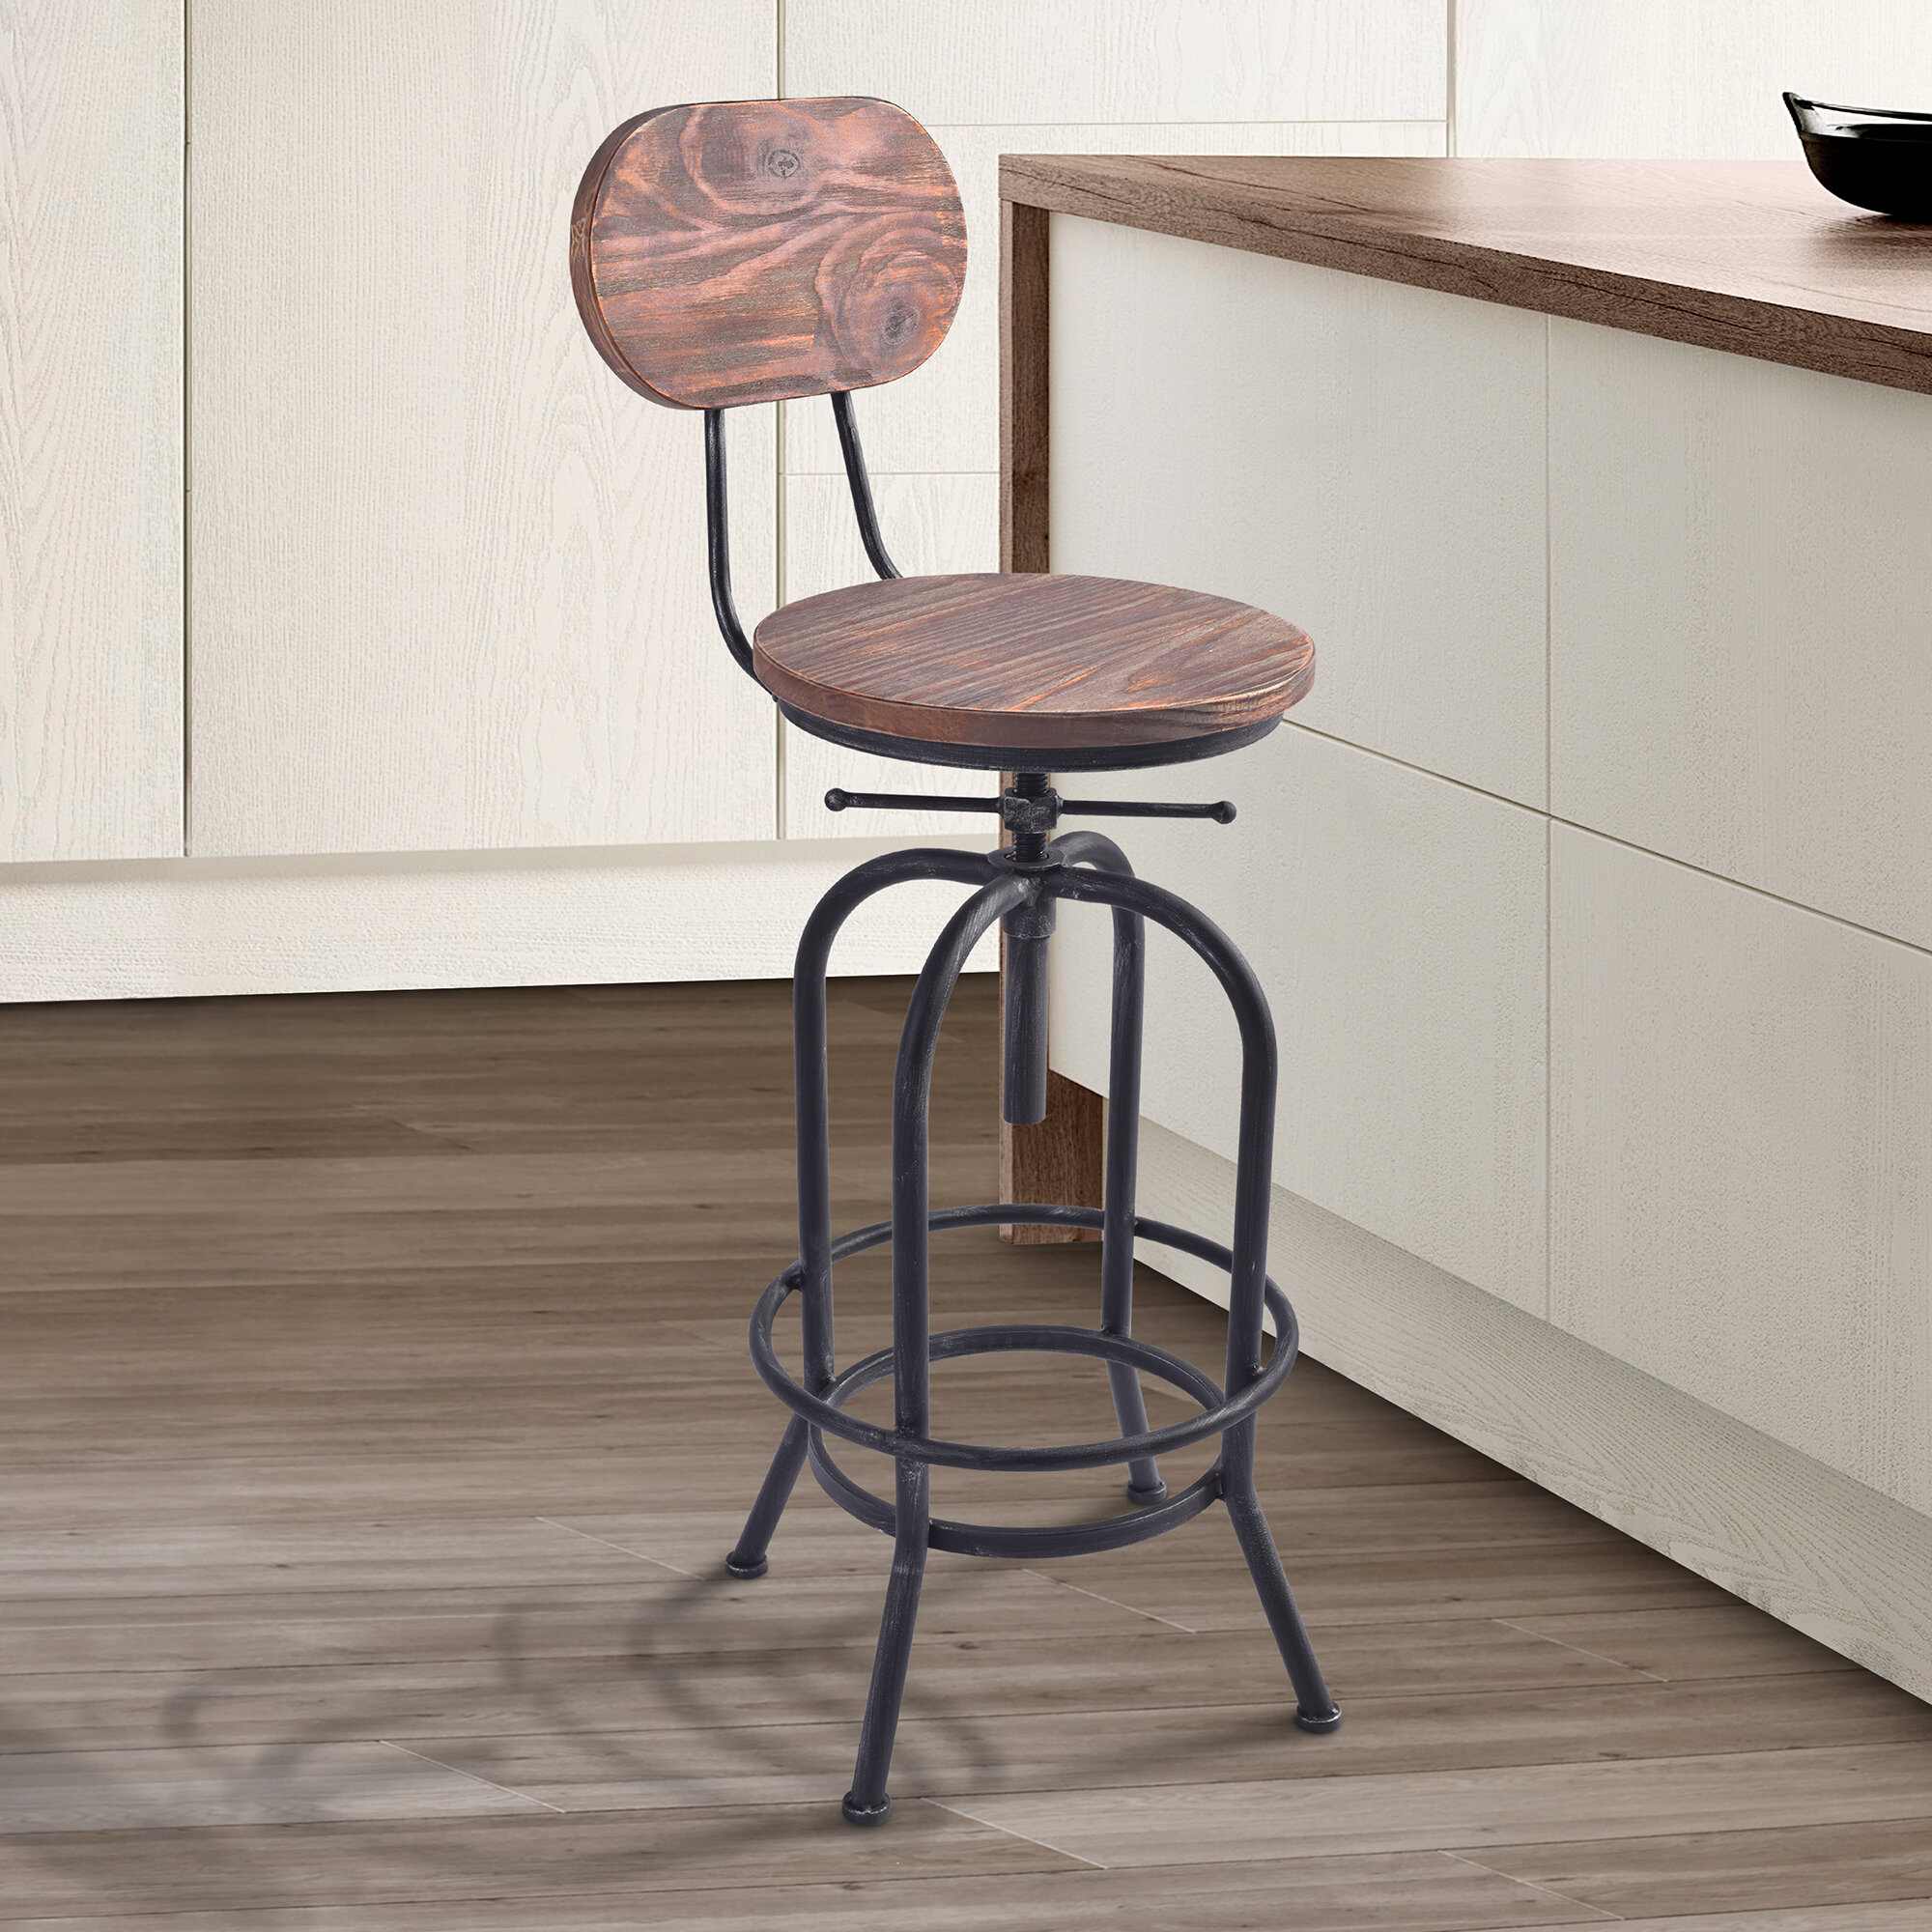 Awe Inspiring Pine Metal Bar Stools Youll Love In 2019 Wayfair Alphanode Cool Chair Designs And Ideas Alphanodeonline